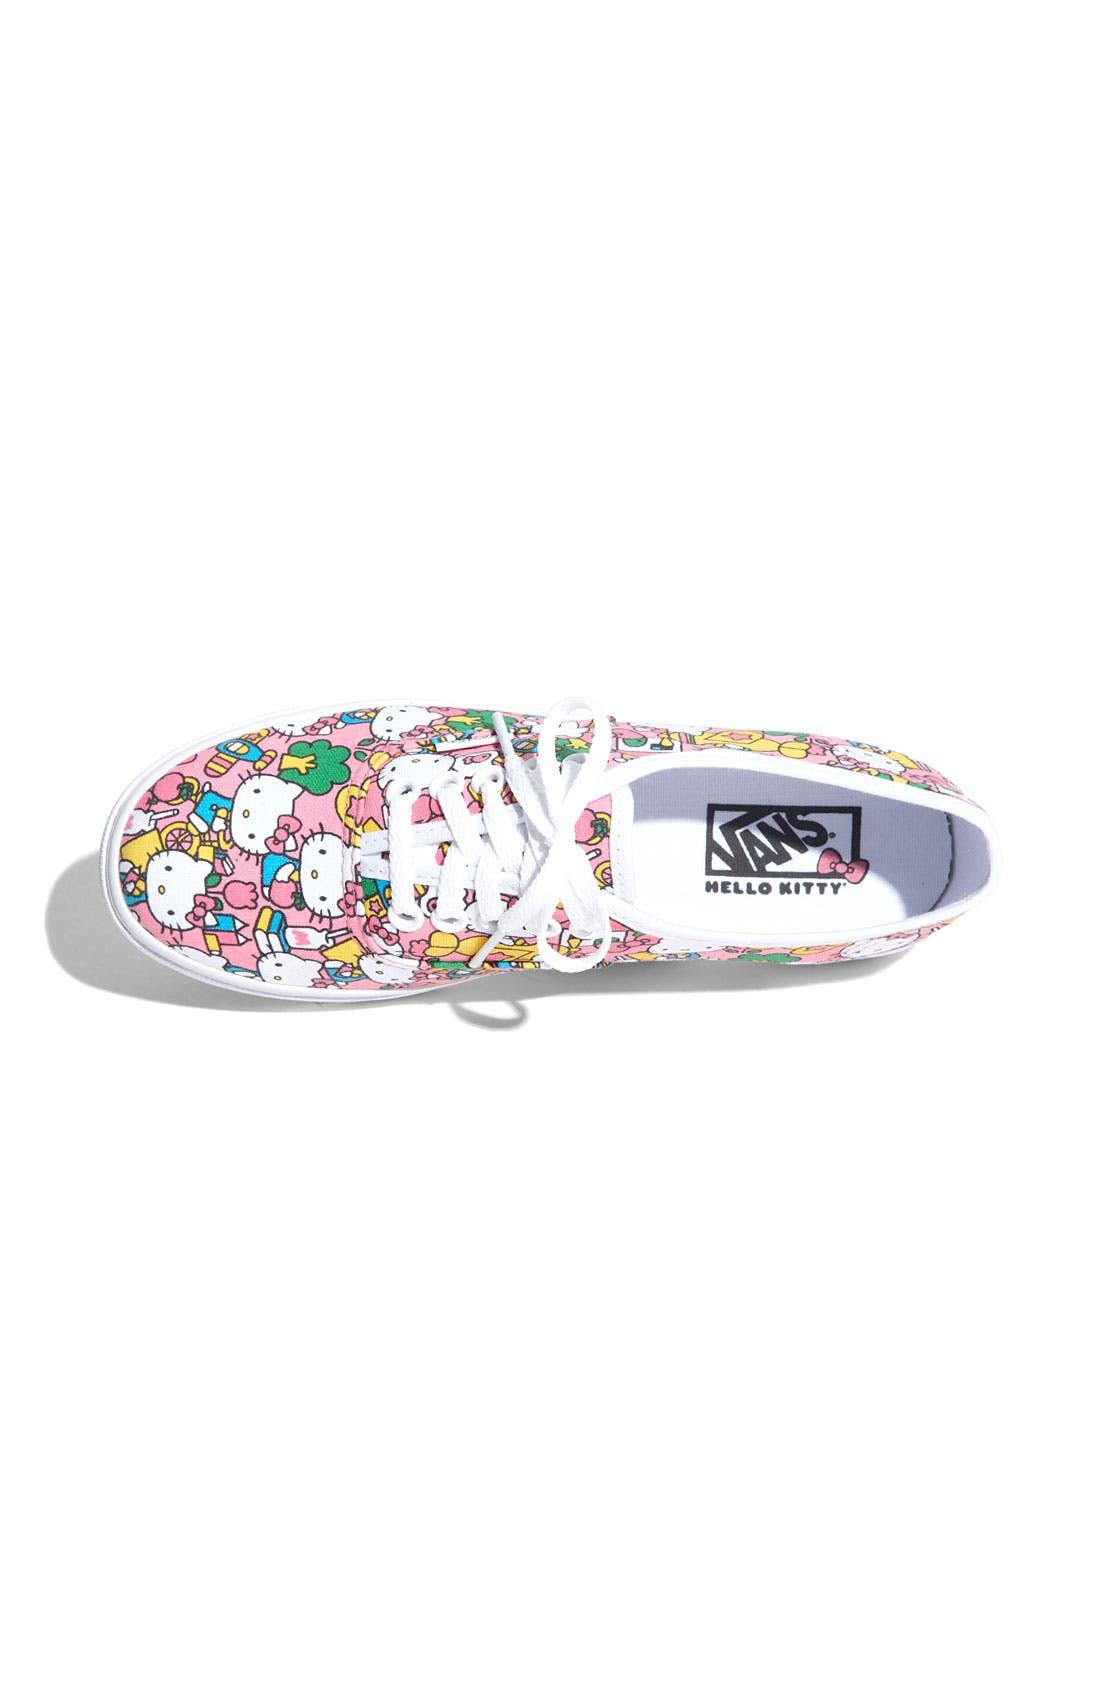 Alternate Image 3  - Vans 'Lo Pro - Hello Kitty®' Sneaker (Women) (Limited Edition)